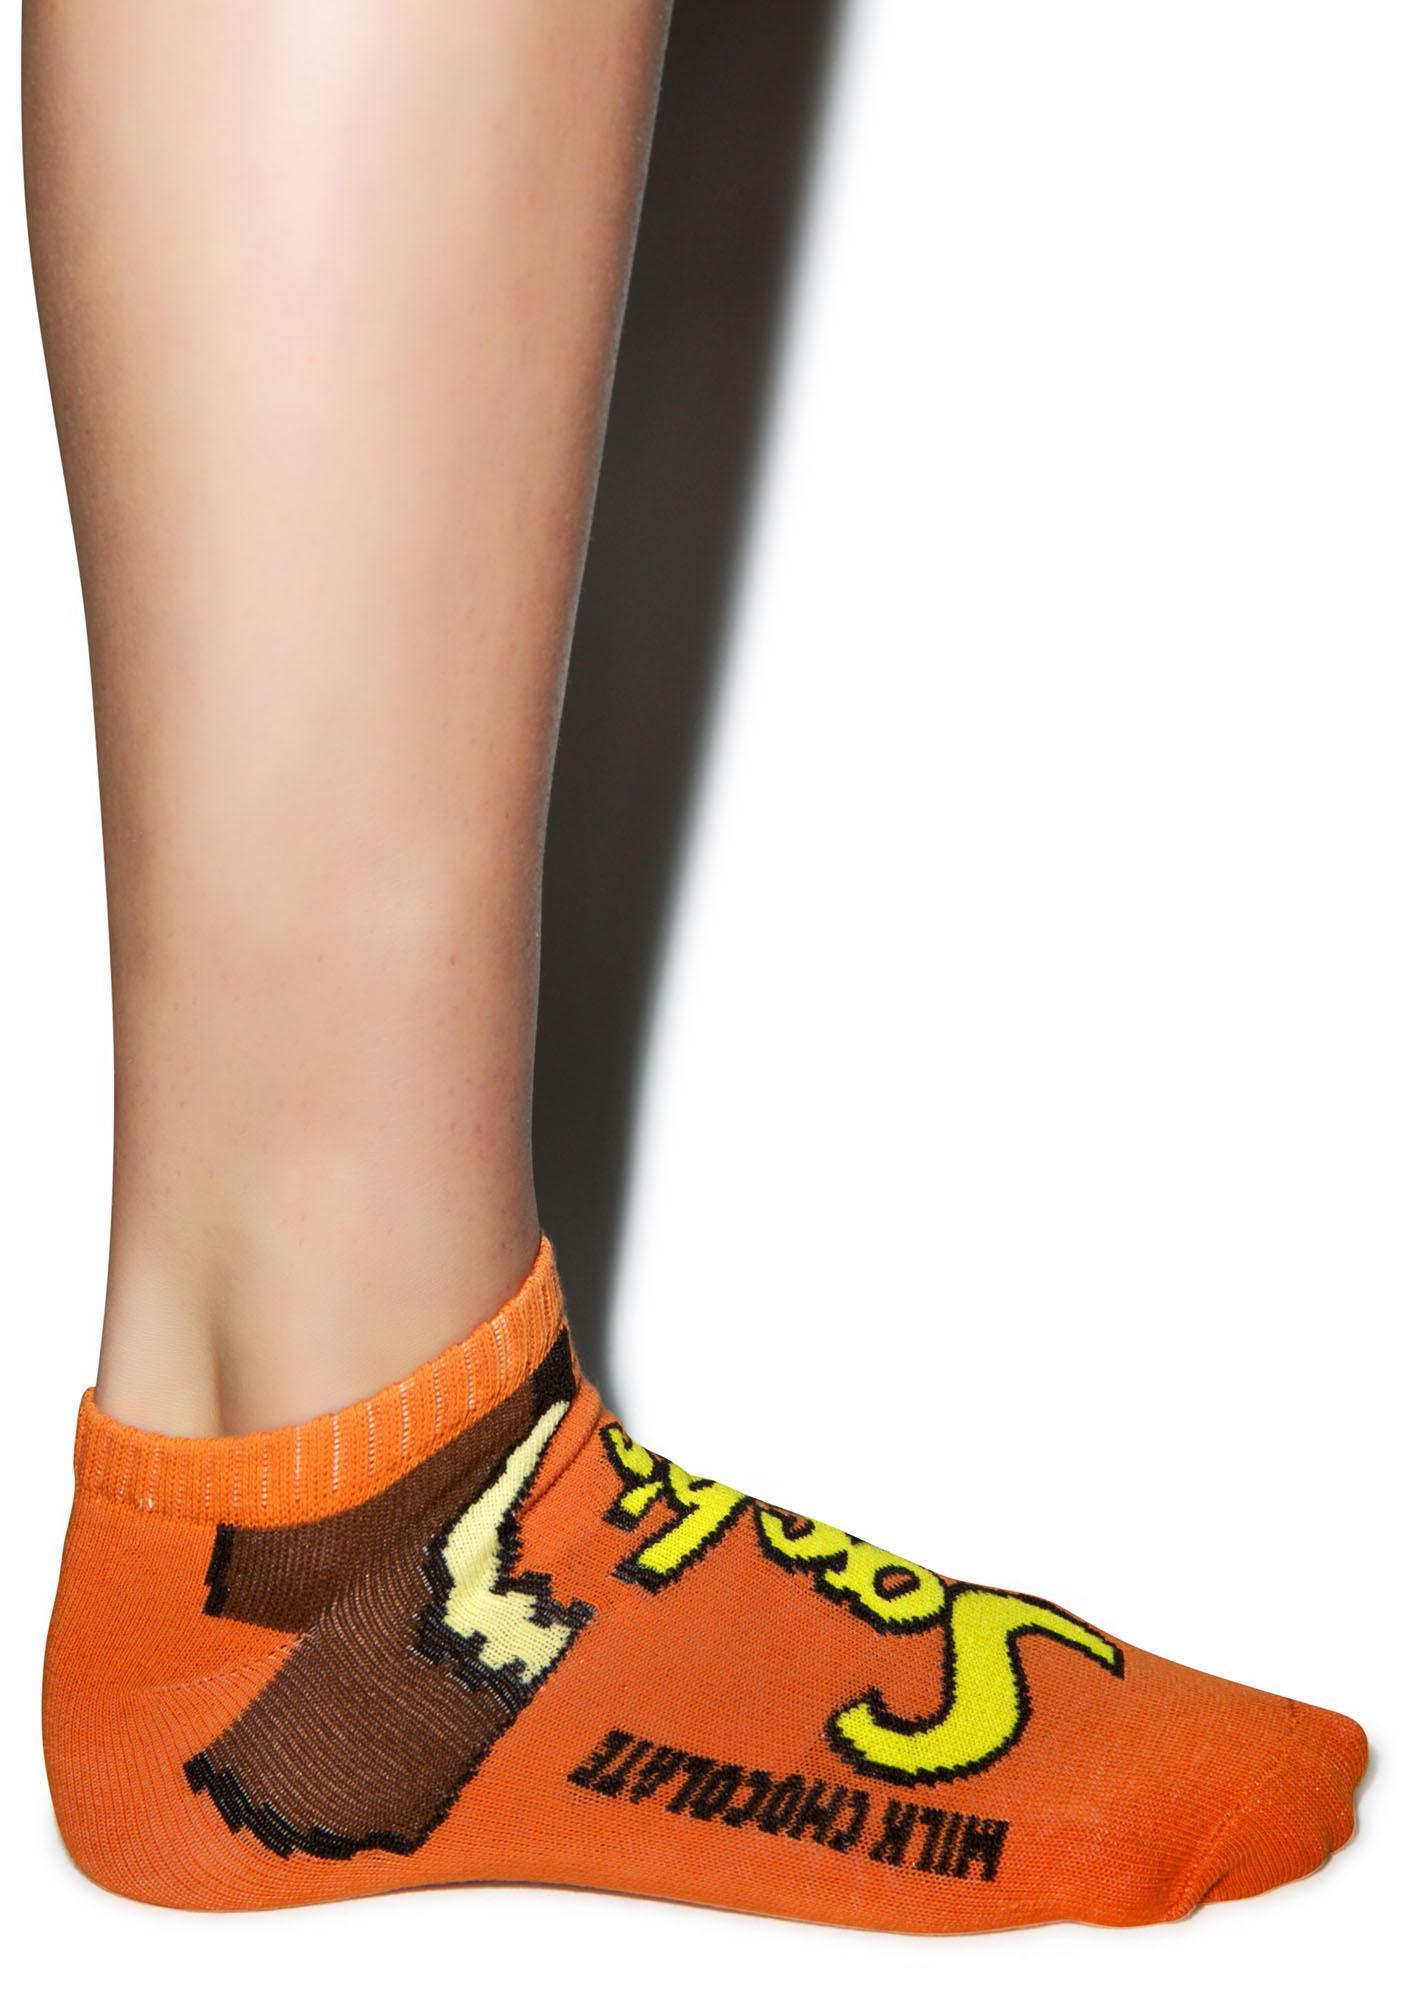 Peanut Butter Cup Socks